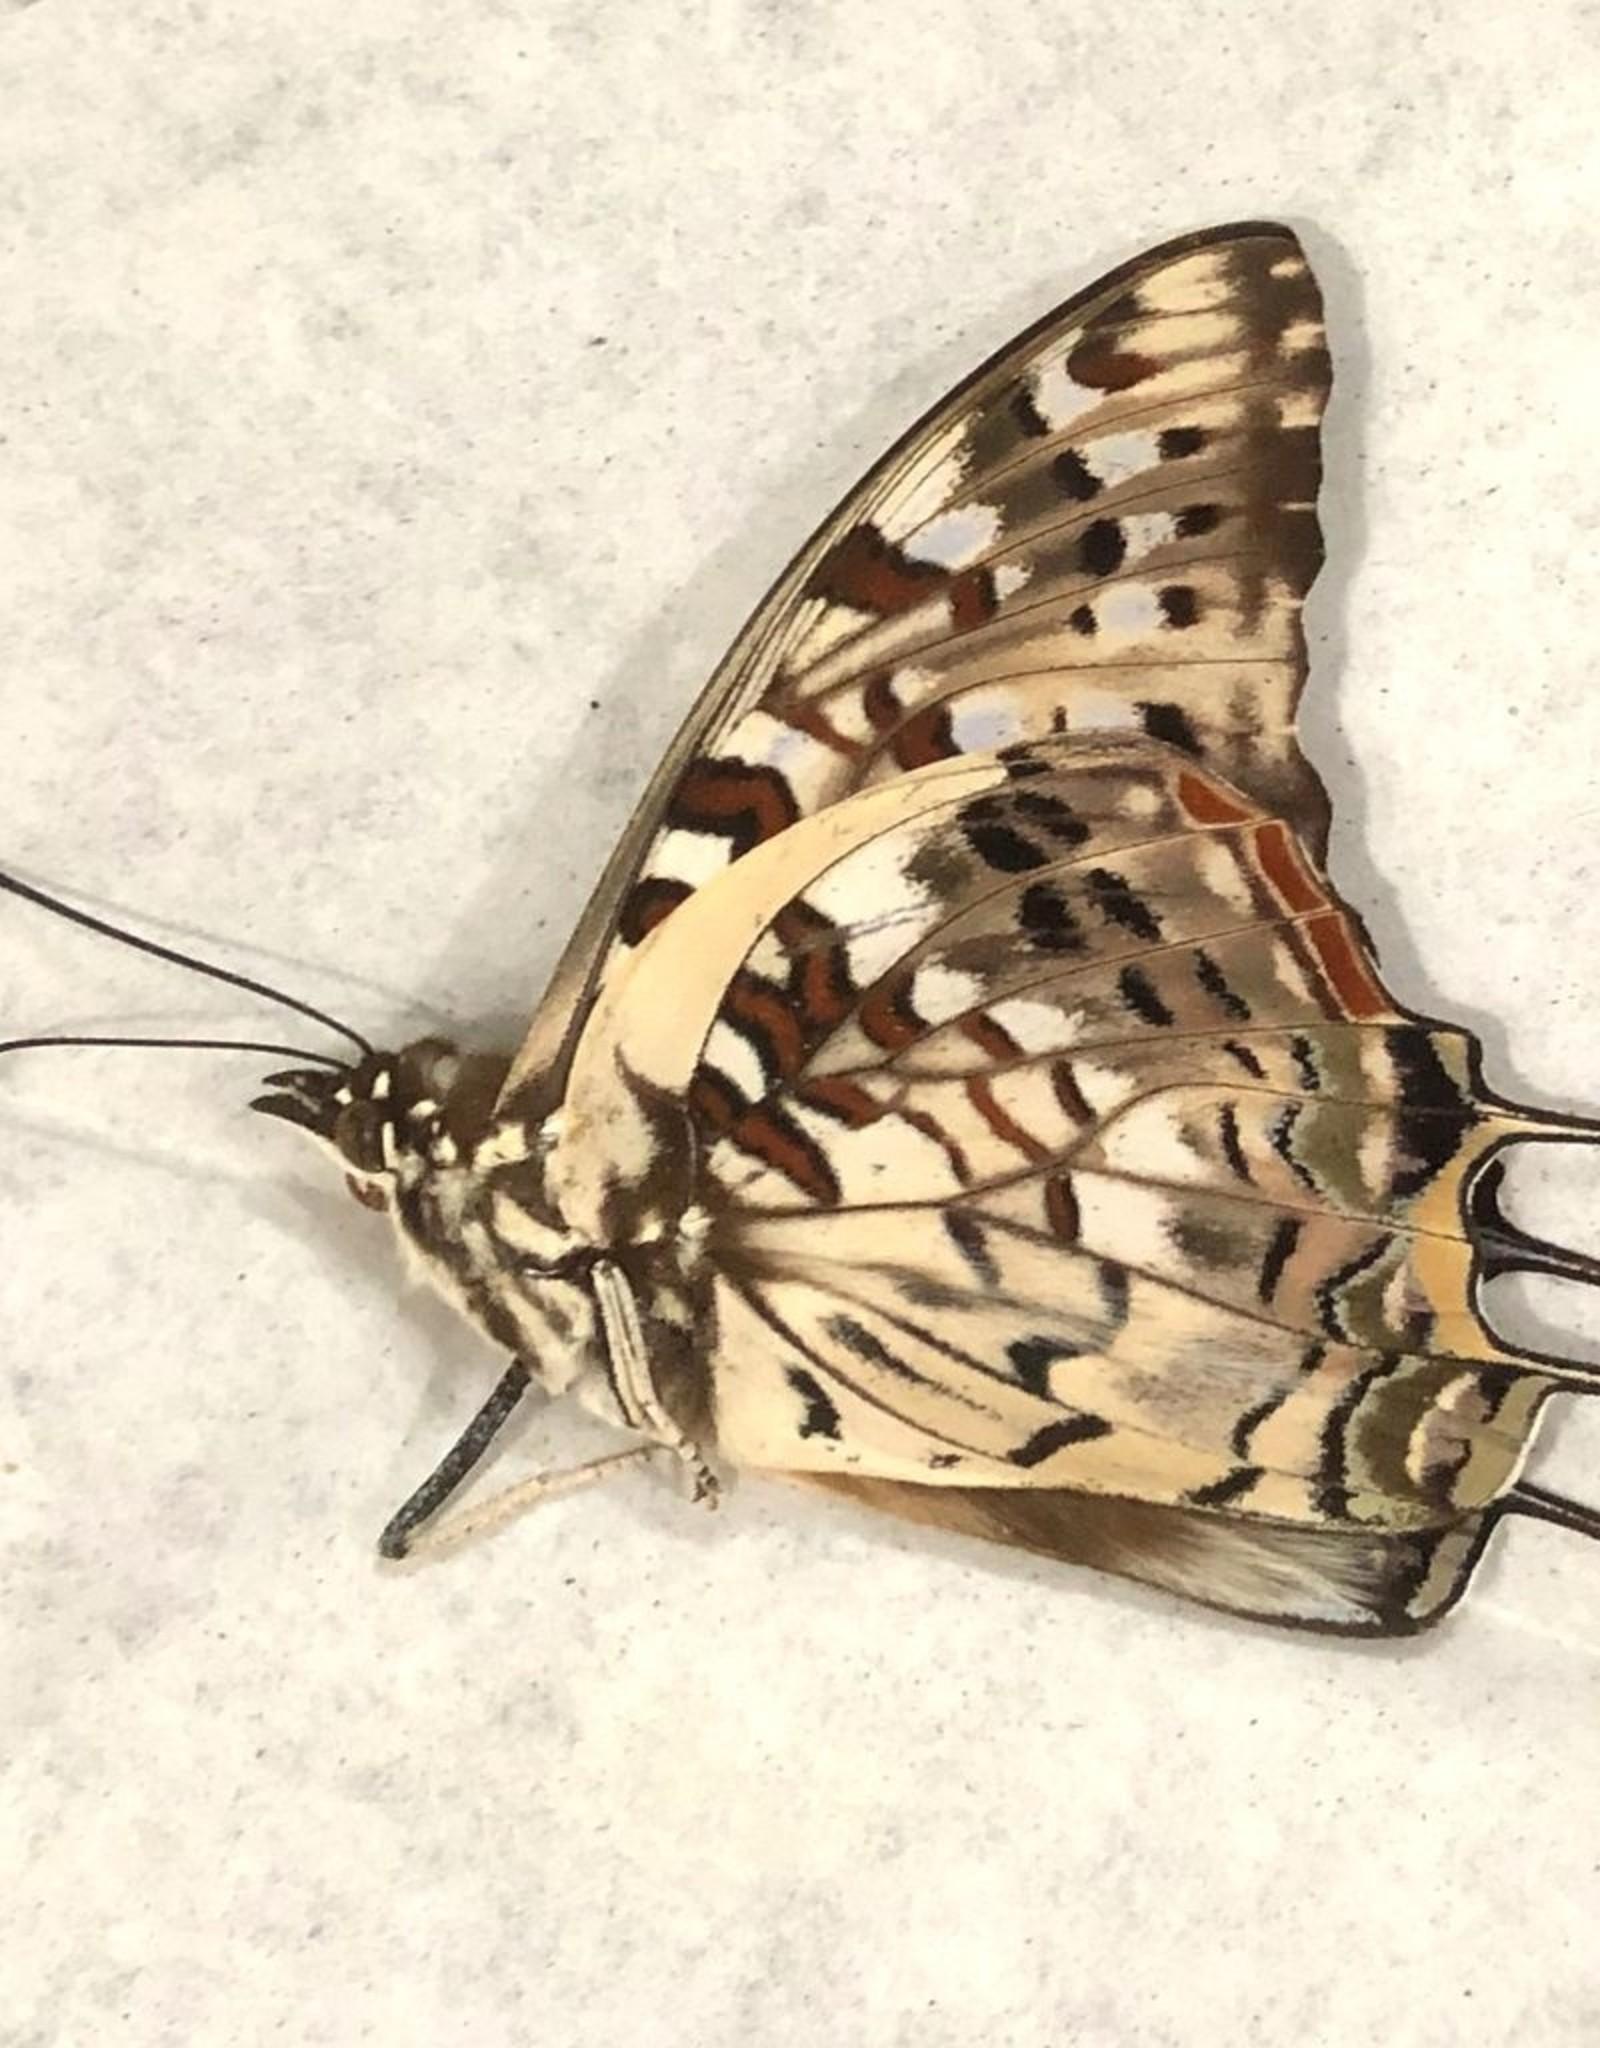 Charaxes cacuthis M A1 Madagascar